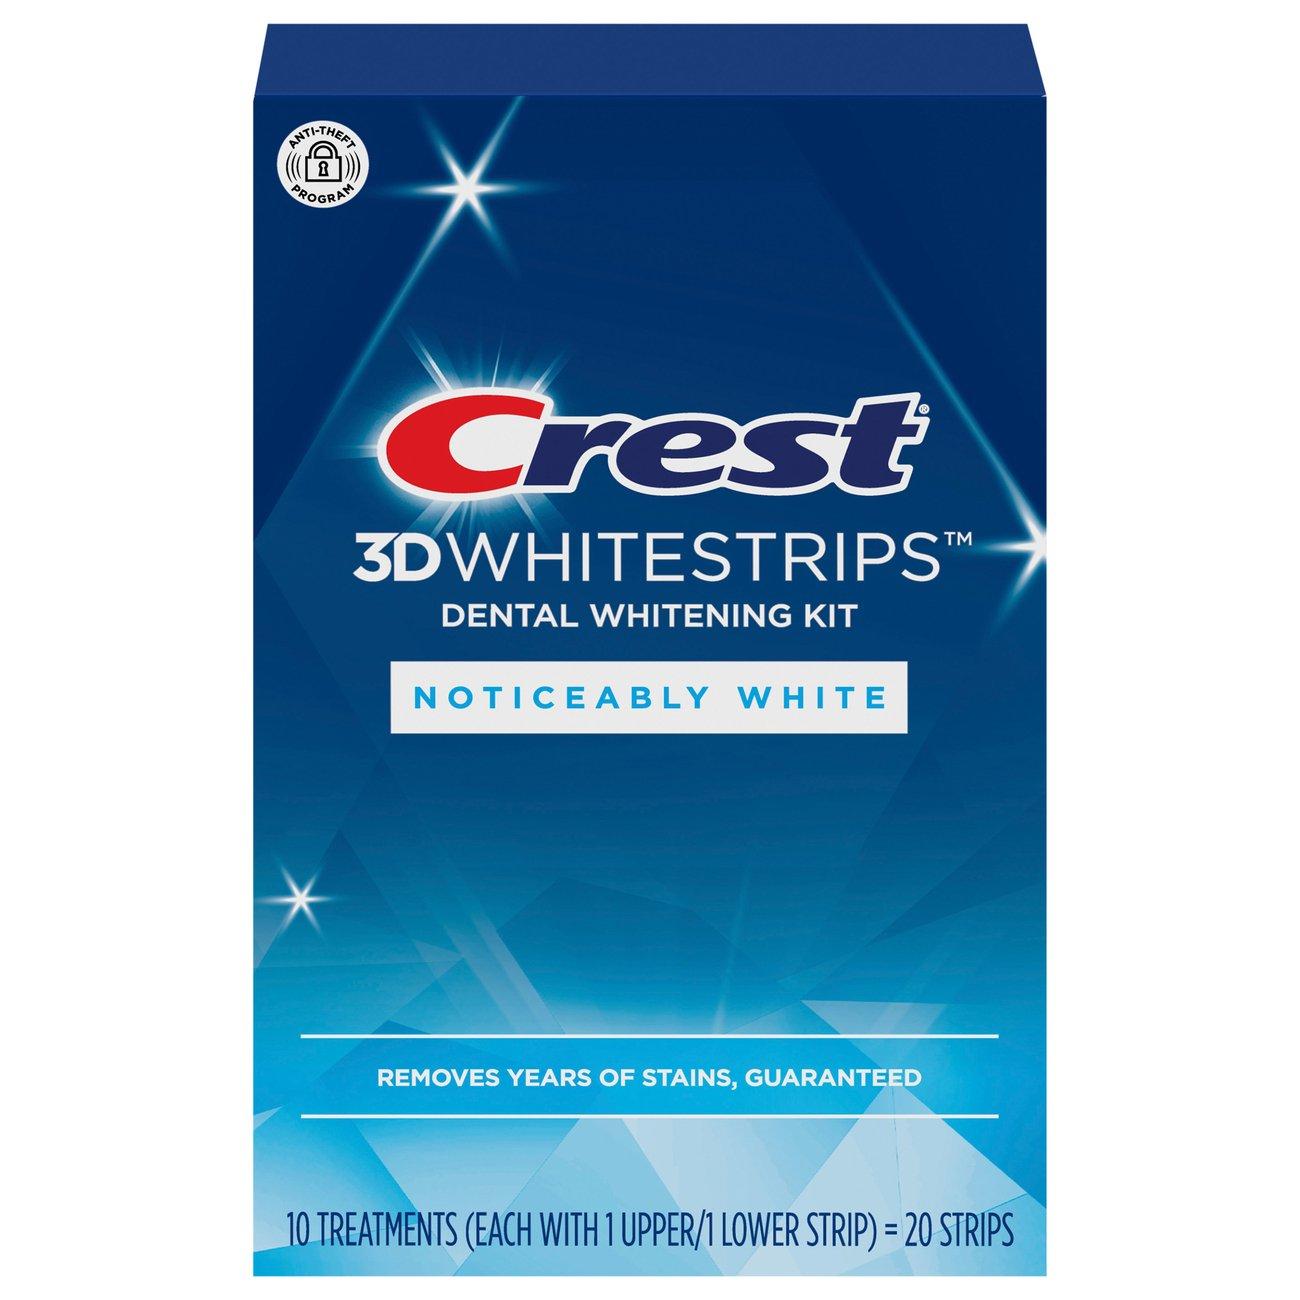 Crest Noticeably White Whitestrips Dental Whitening Kit ‑ Shop